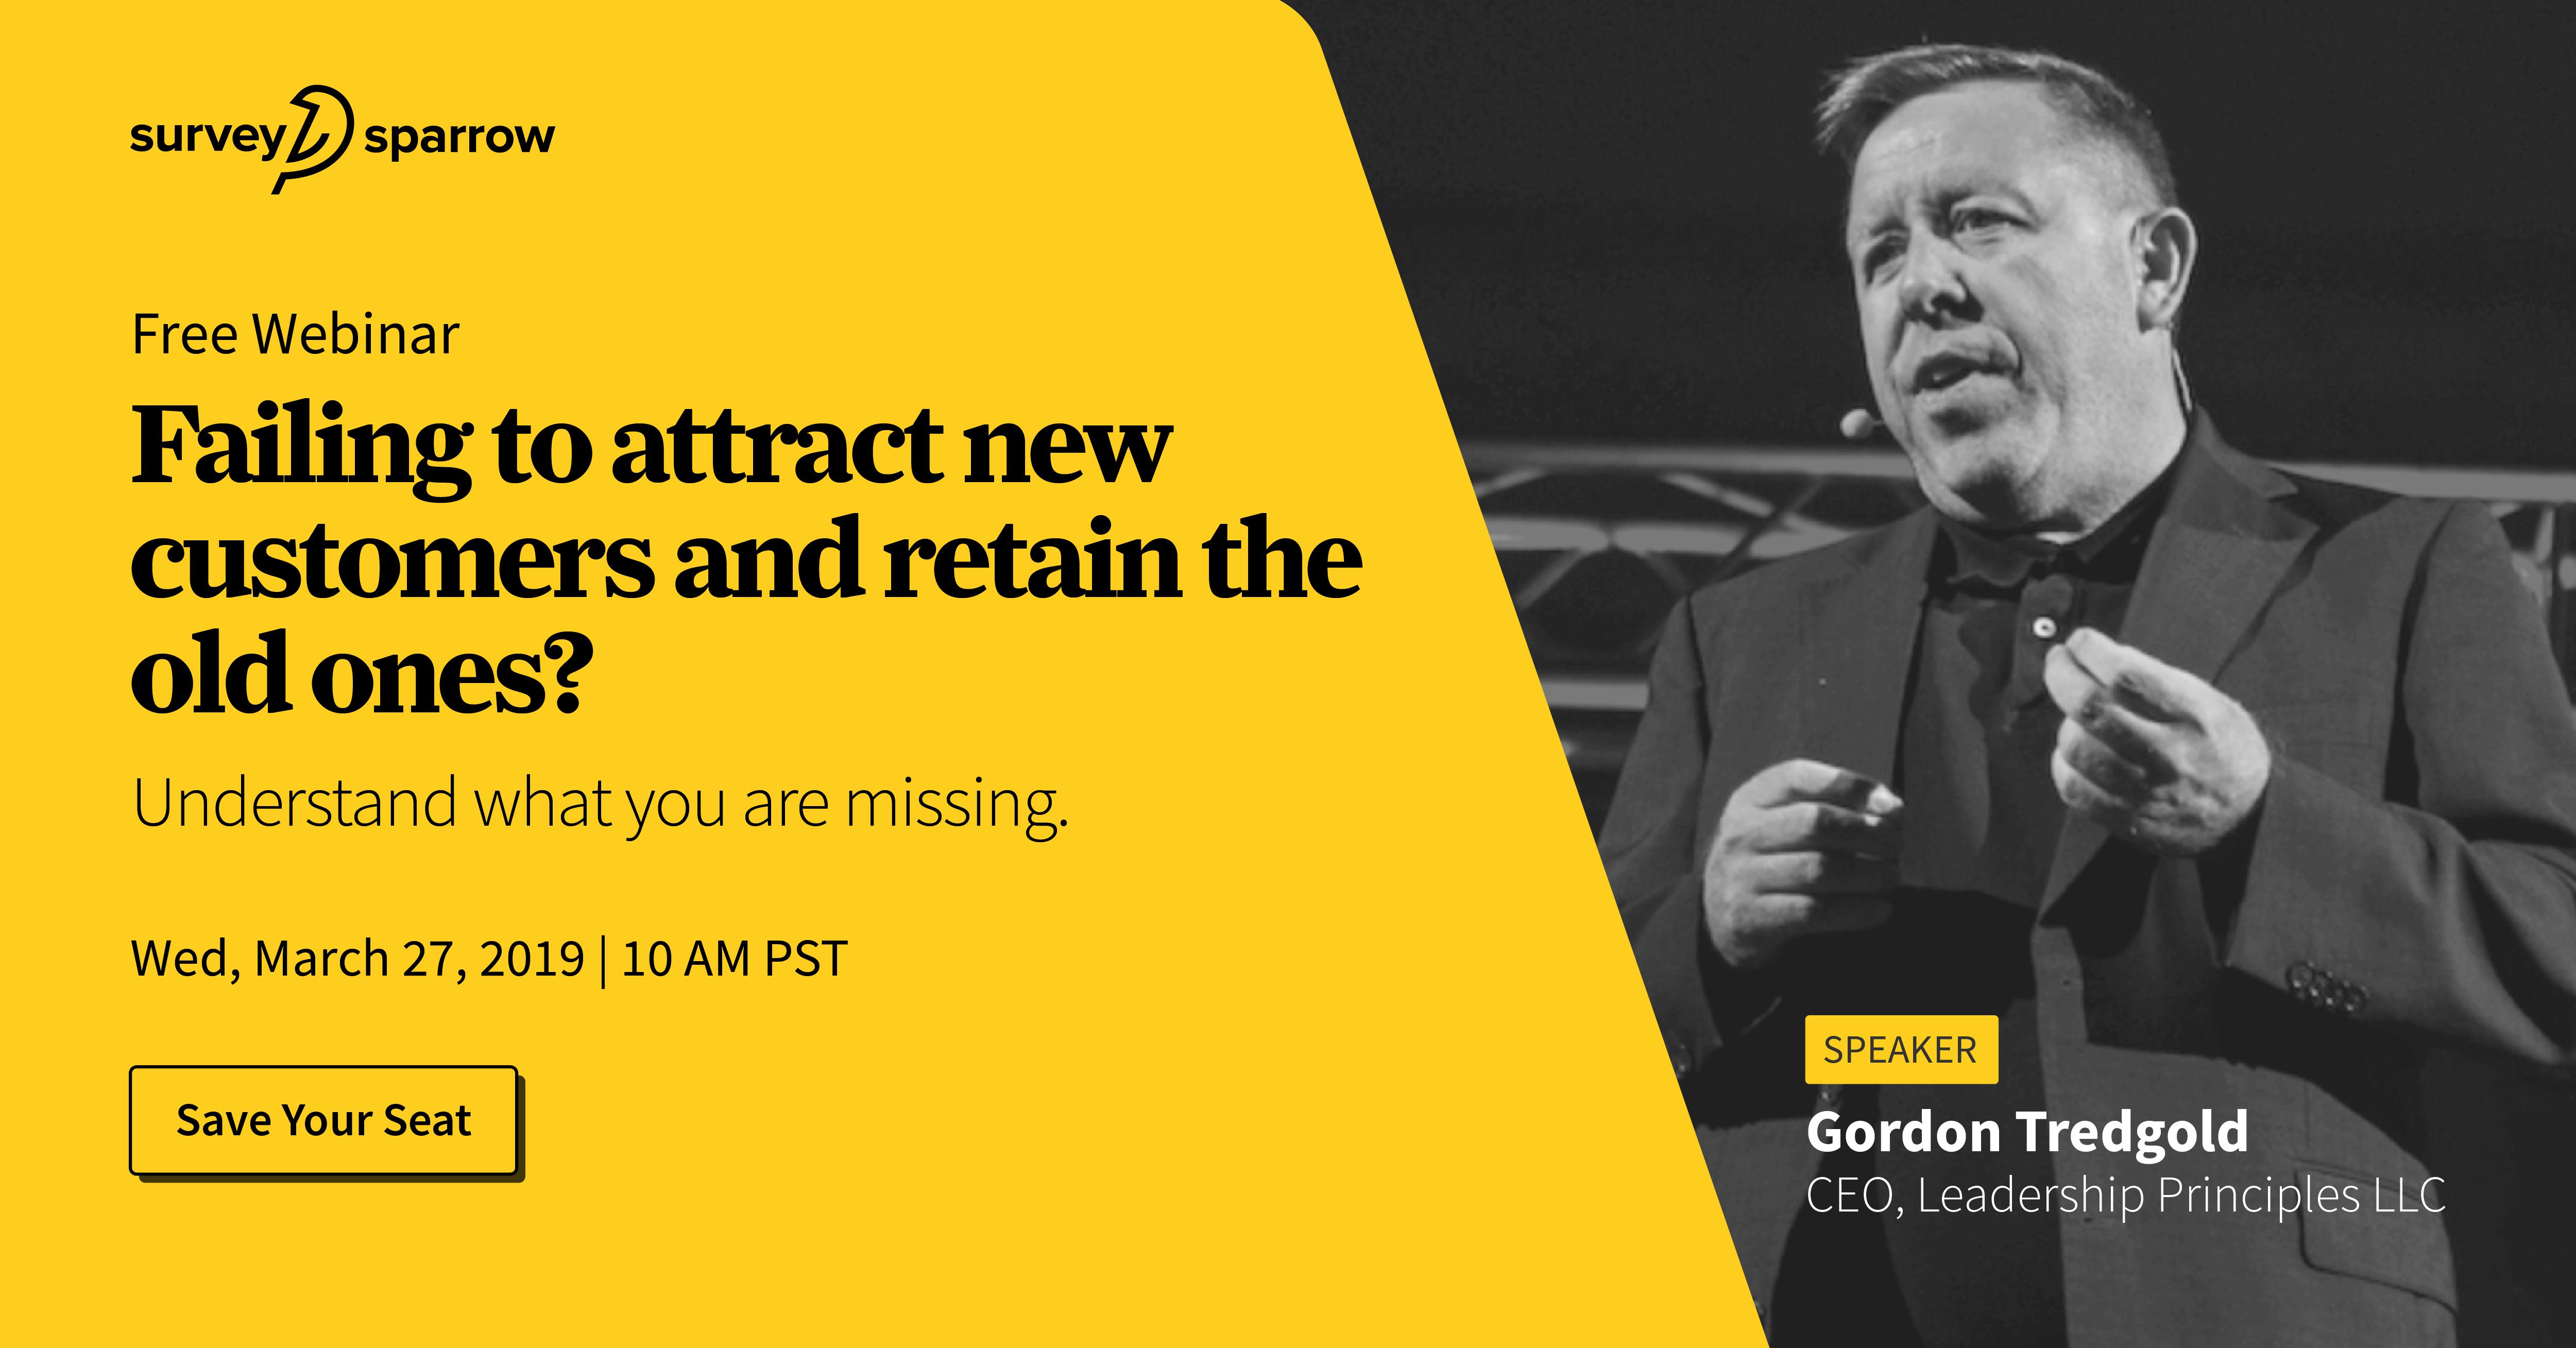 Failing to attract & retain customers? | Gordon Tredgold